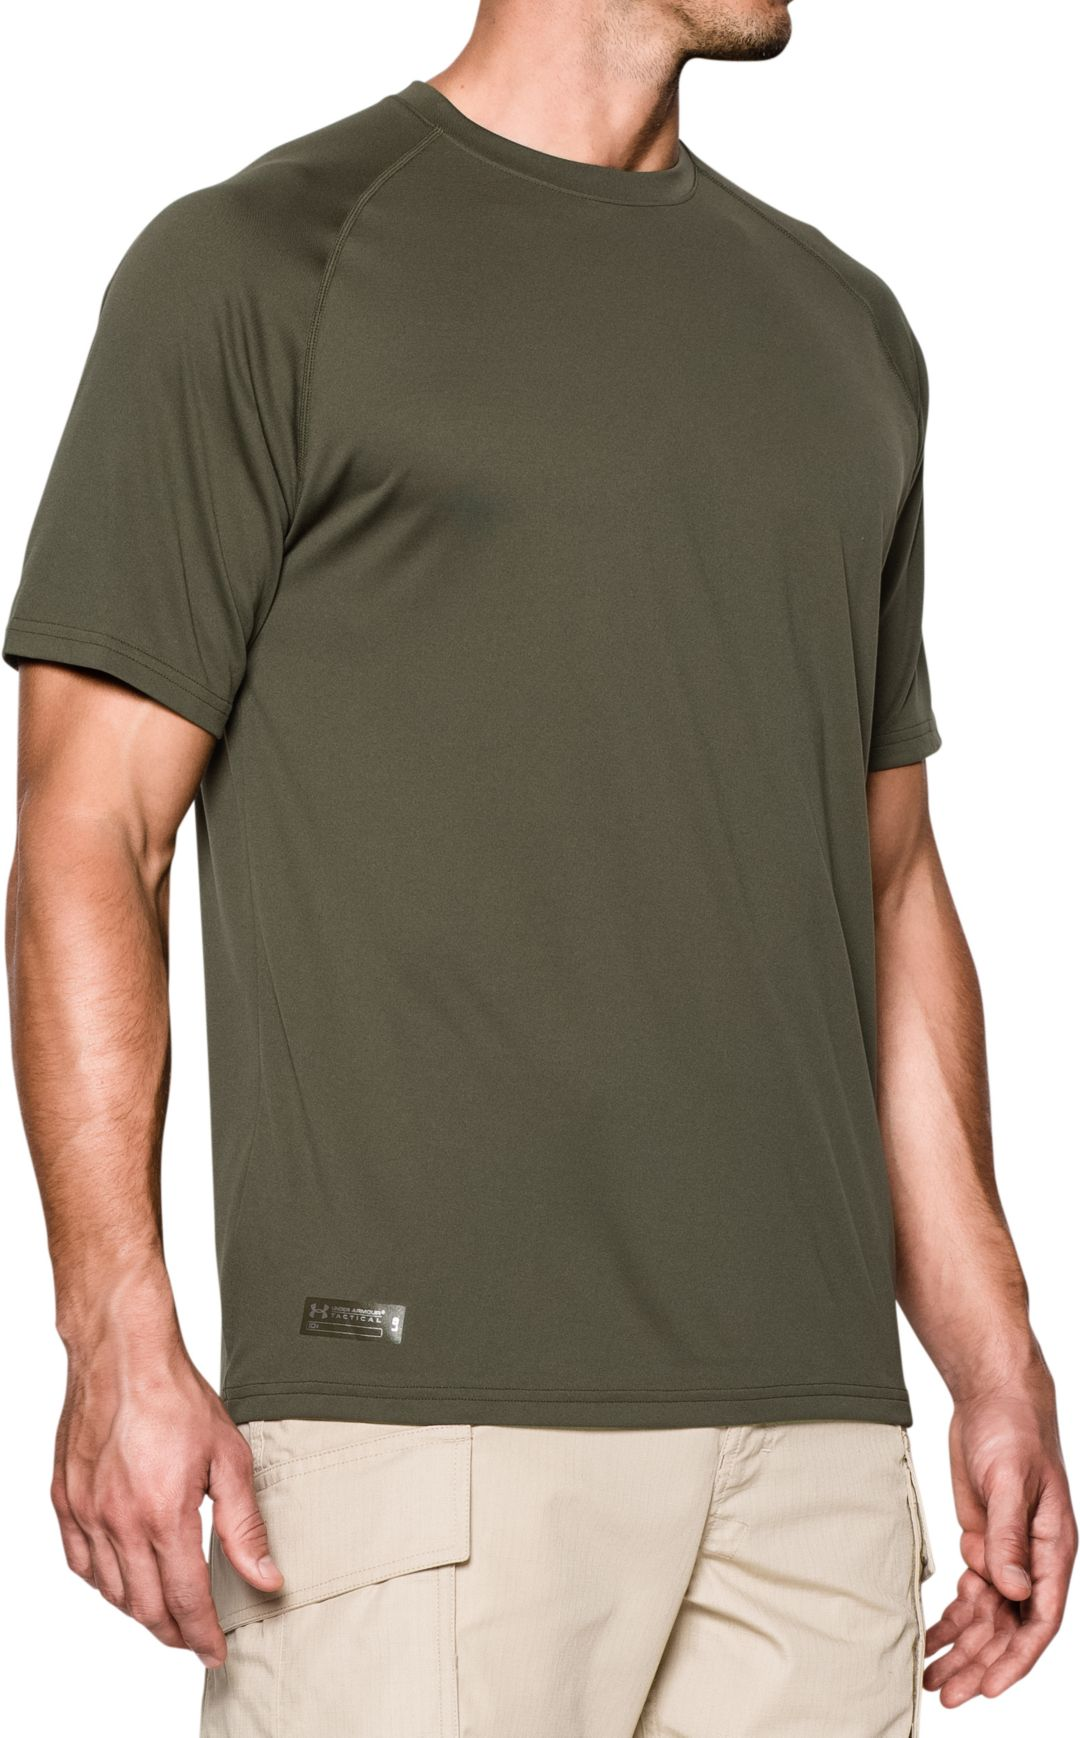 ba88e099 Under Armour Men's Tactical Tech T-Shirt